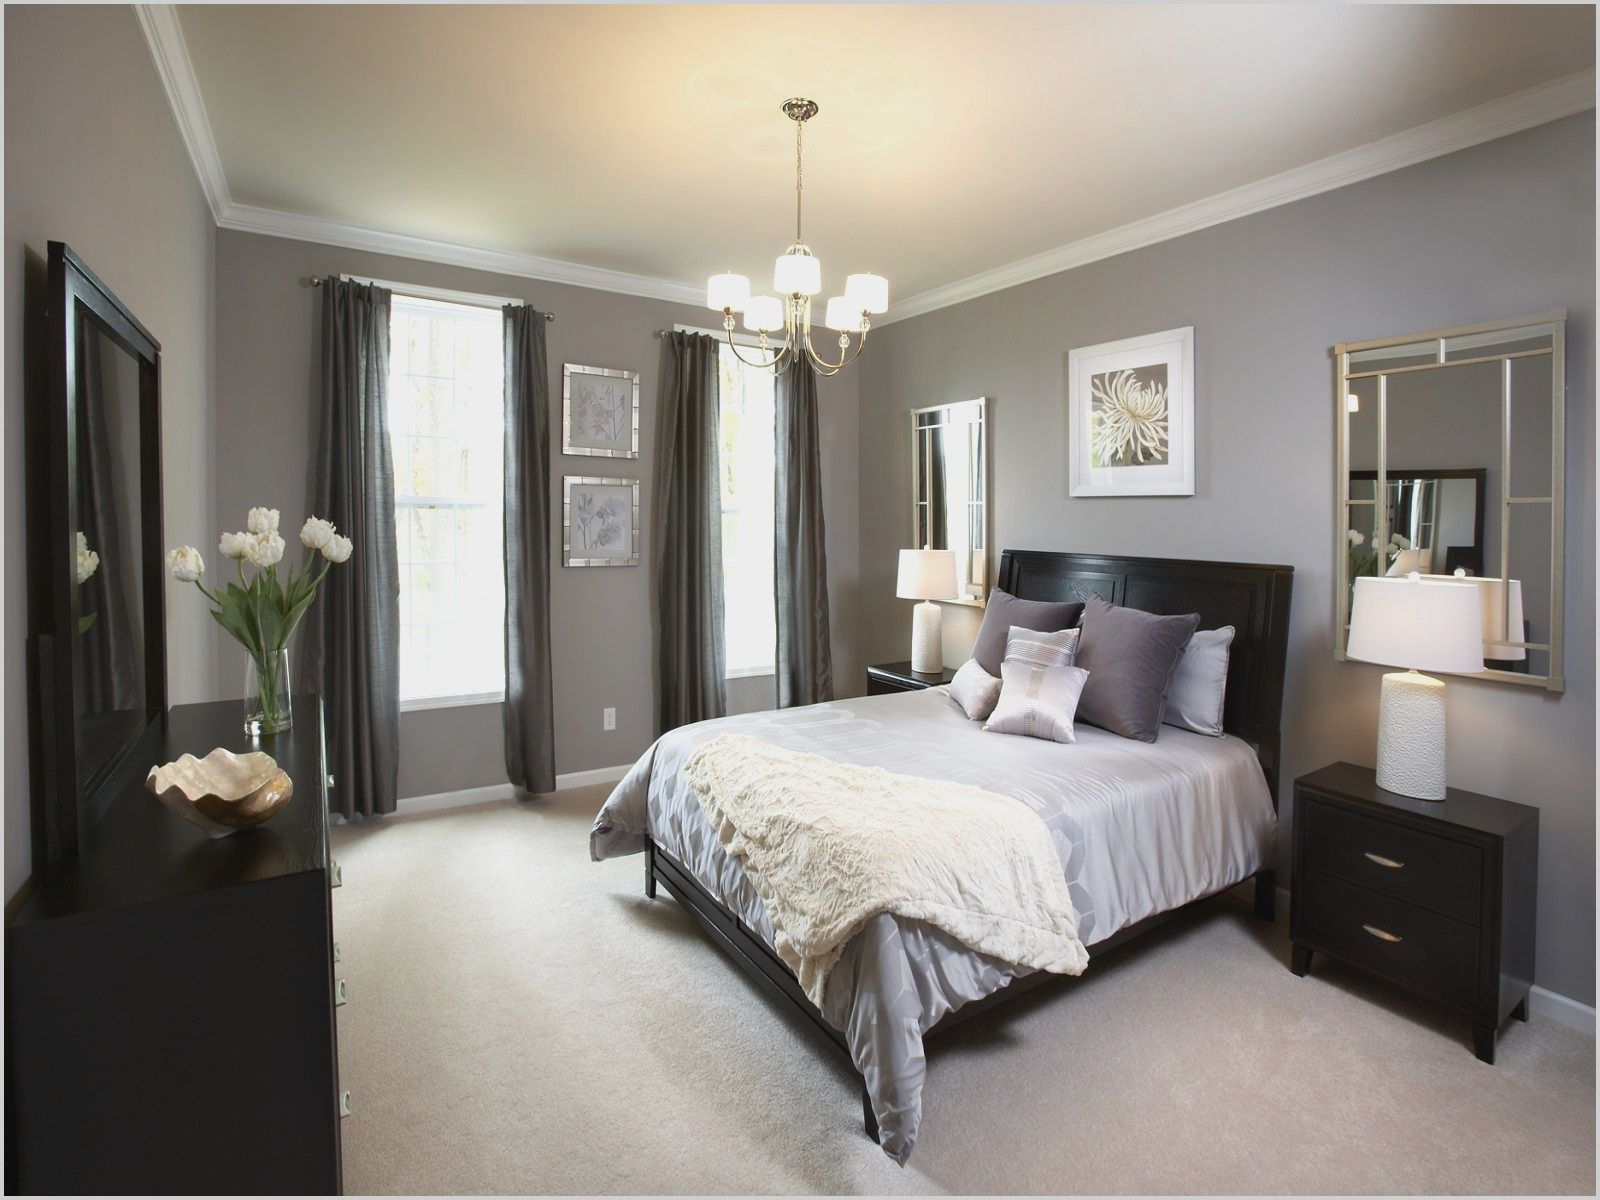 Master Bedroom Decorating Ideas Dark Furniture In 2020 Gray Master Bedroom Master Bedrooms Decor Remodel Bedroom